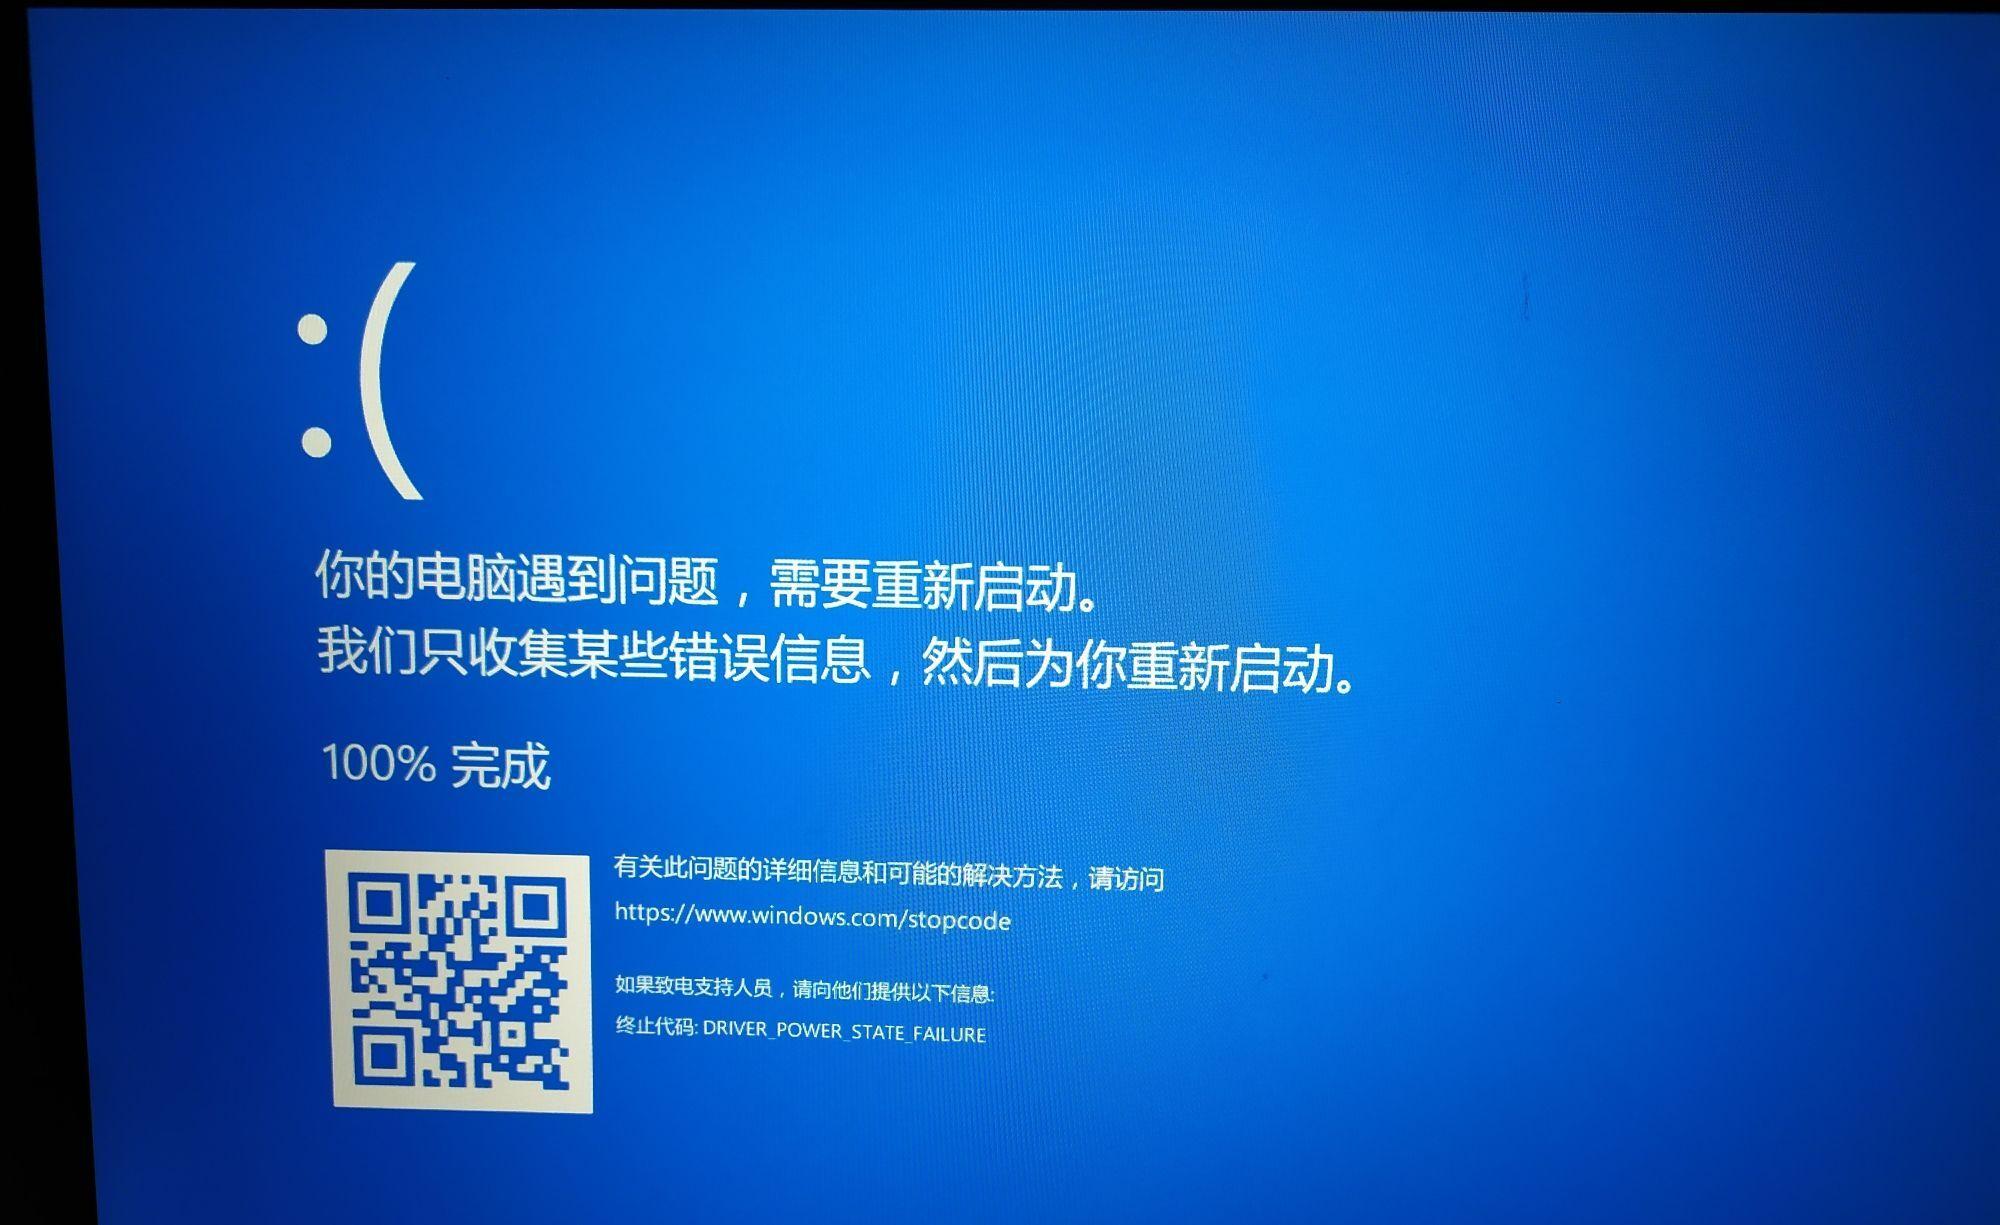 Xaf993120190218081508.jpg